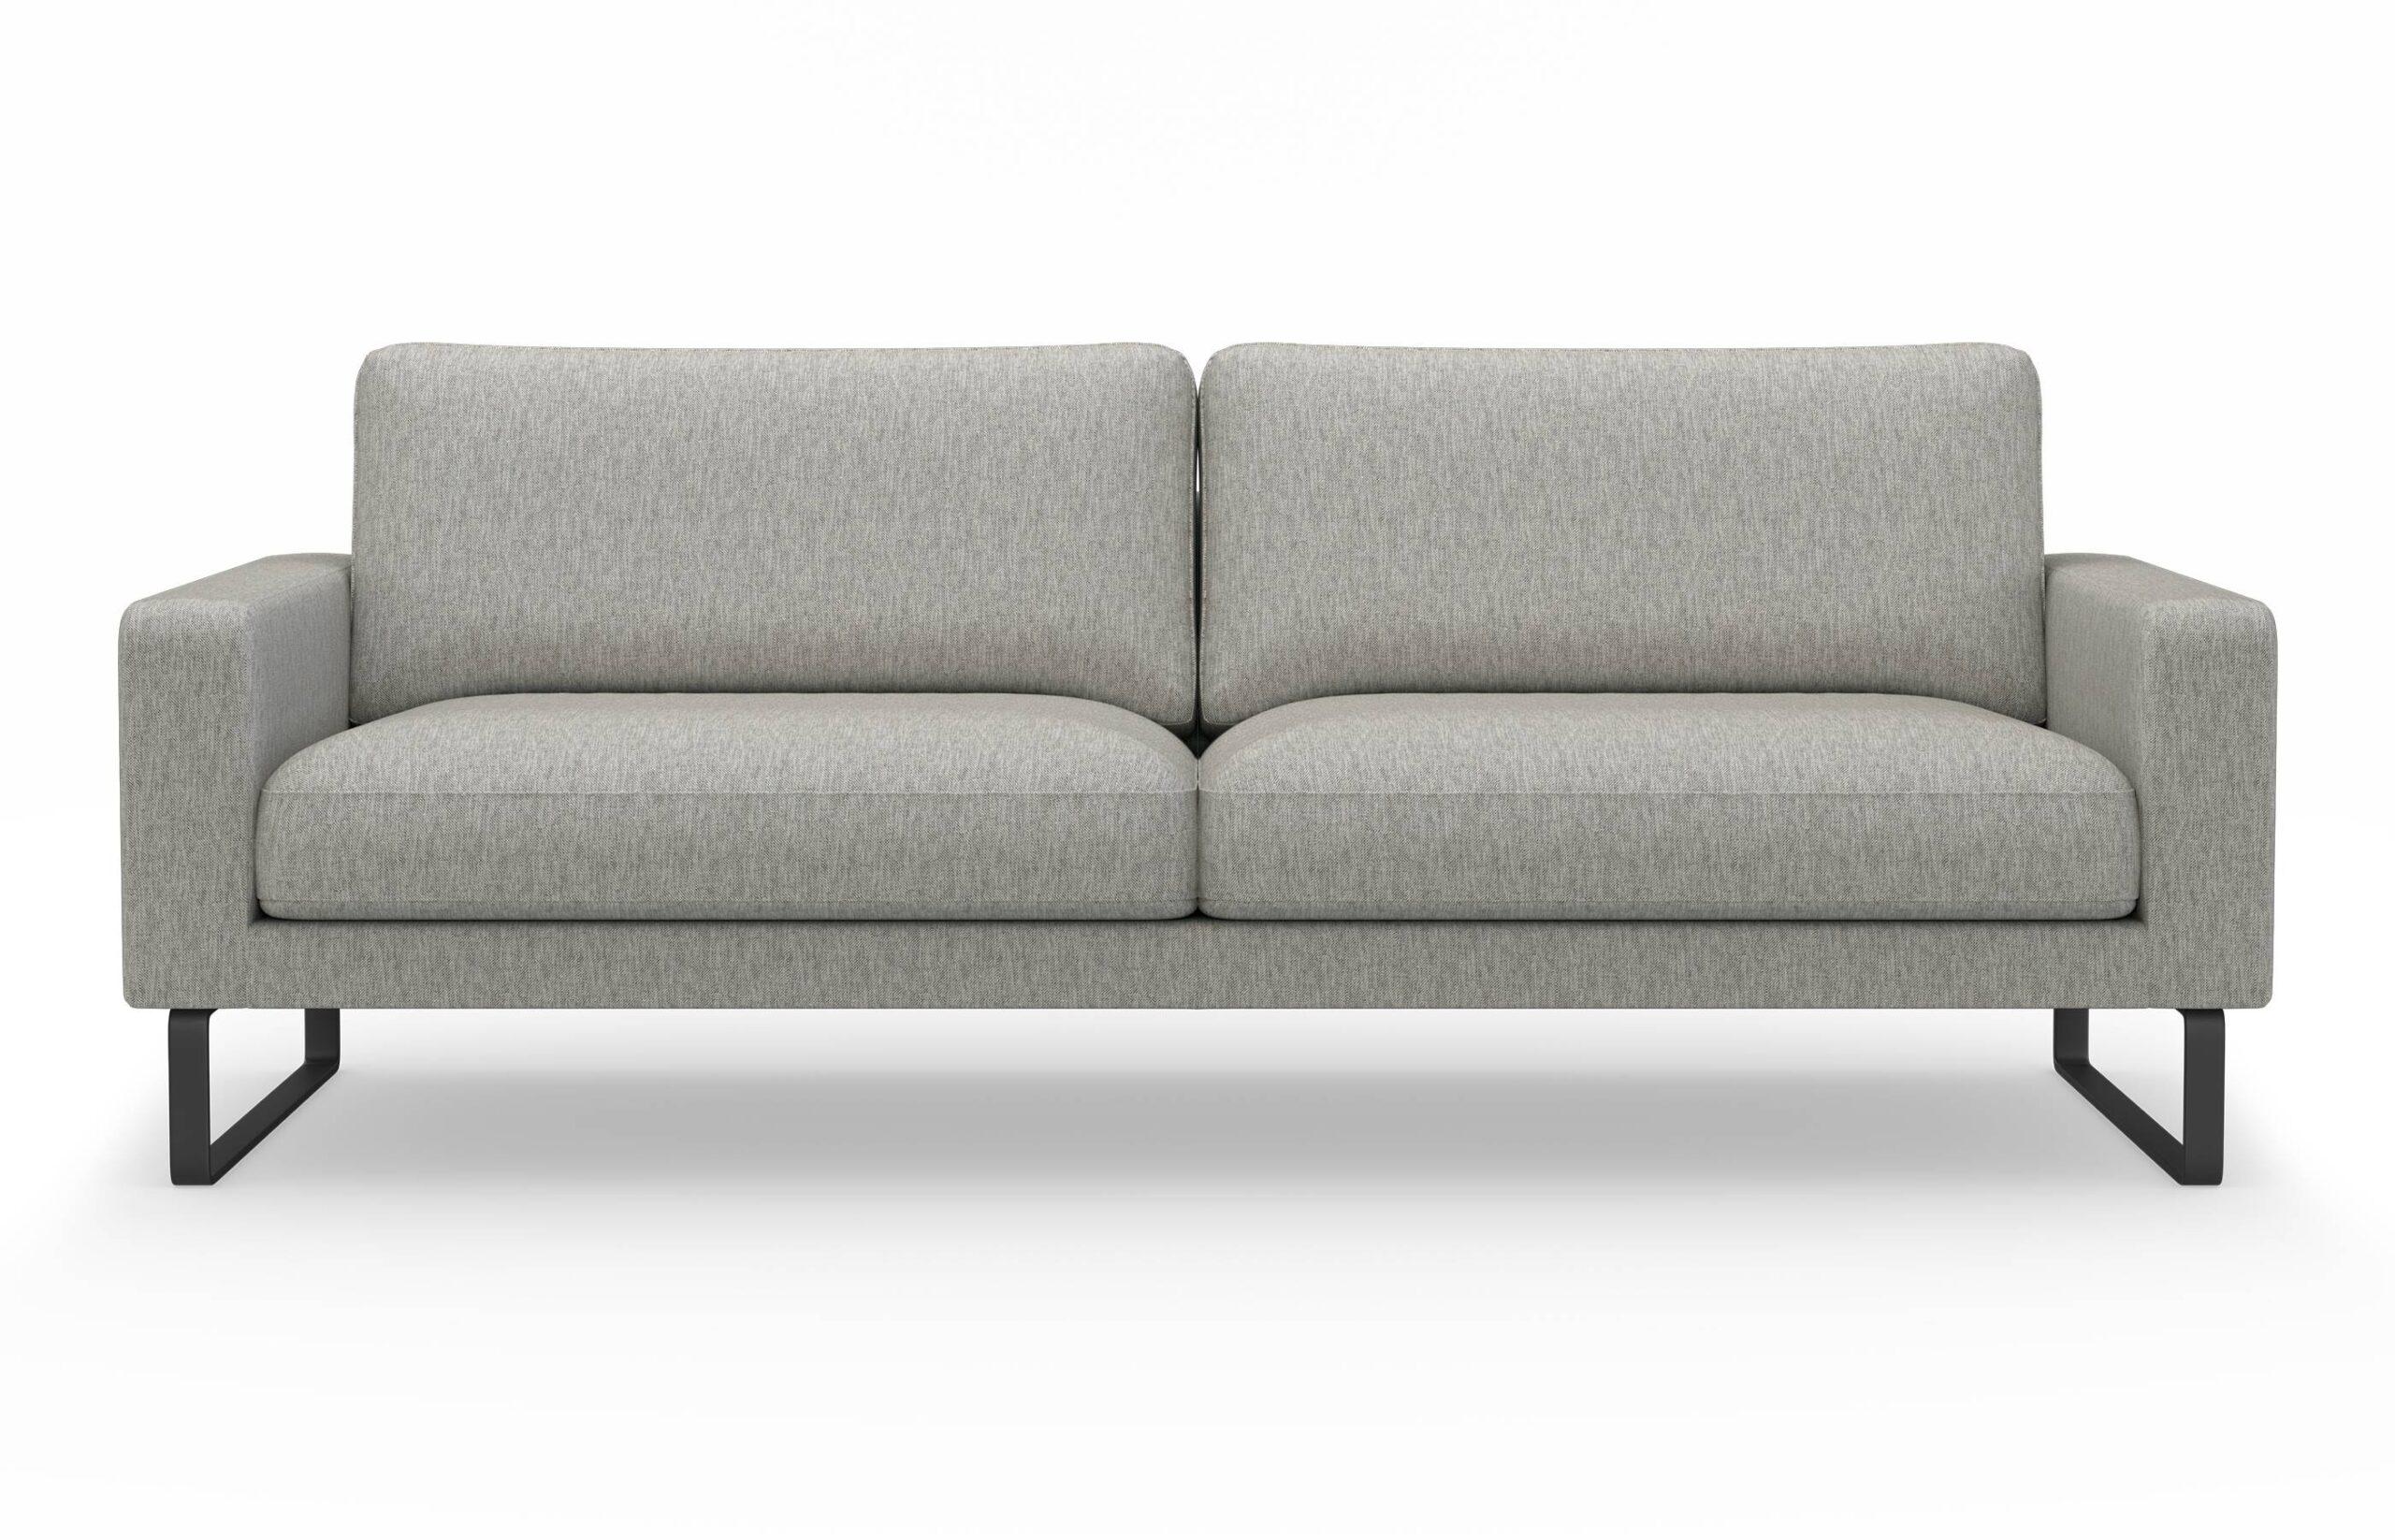 Full Size of Sofa 3 Sitzer Grau Couch 2 Und Samt Louisiana (3 Sitzer Mit Polster Grau) Leder 3 Sitzer Nino Schwarz/grau Rattan Tom Sitzfeldtcom Reinigen Hannover Günstig Sofa Sofa 3 Sitzer Grau